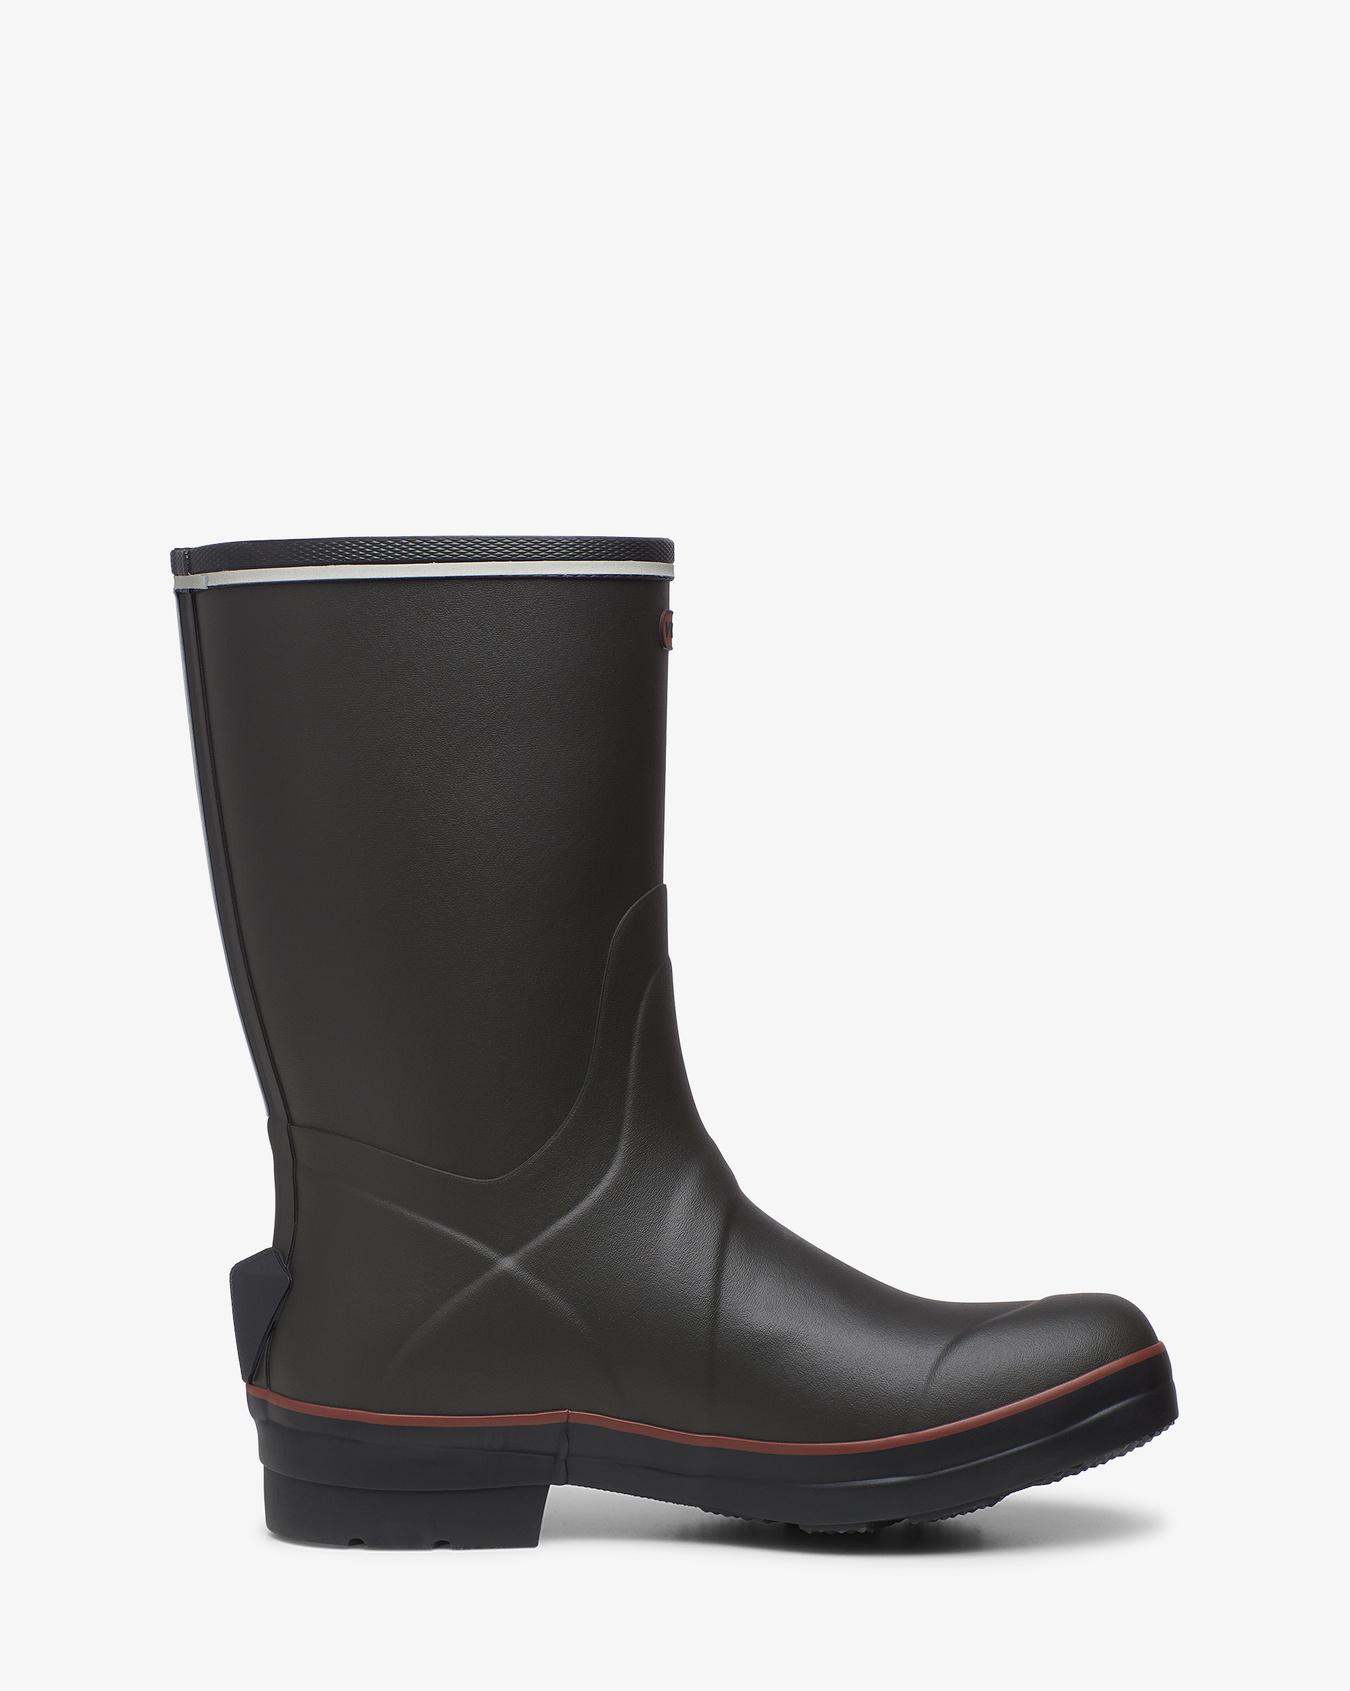 Hedmark Rubber Boot